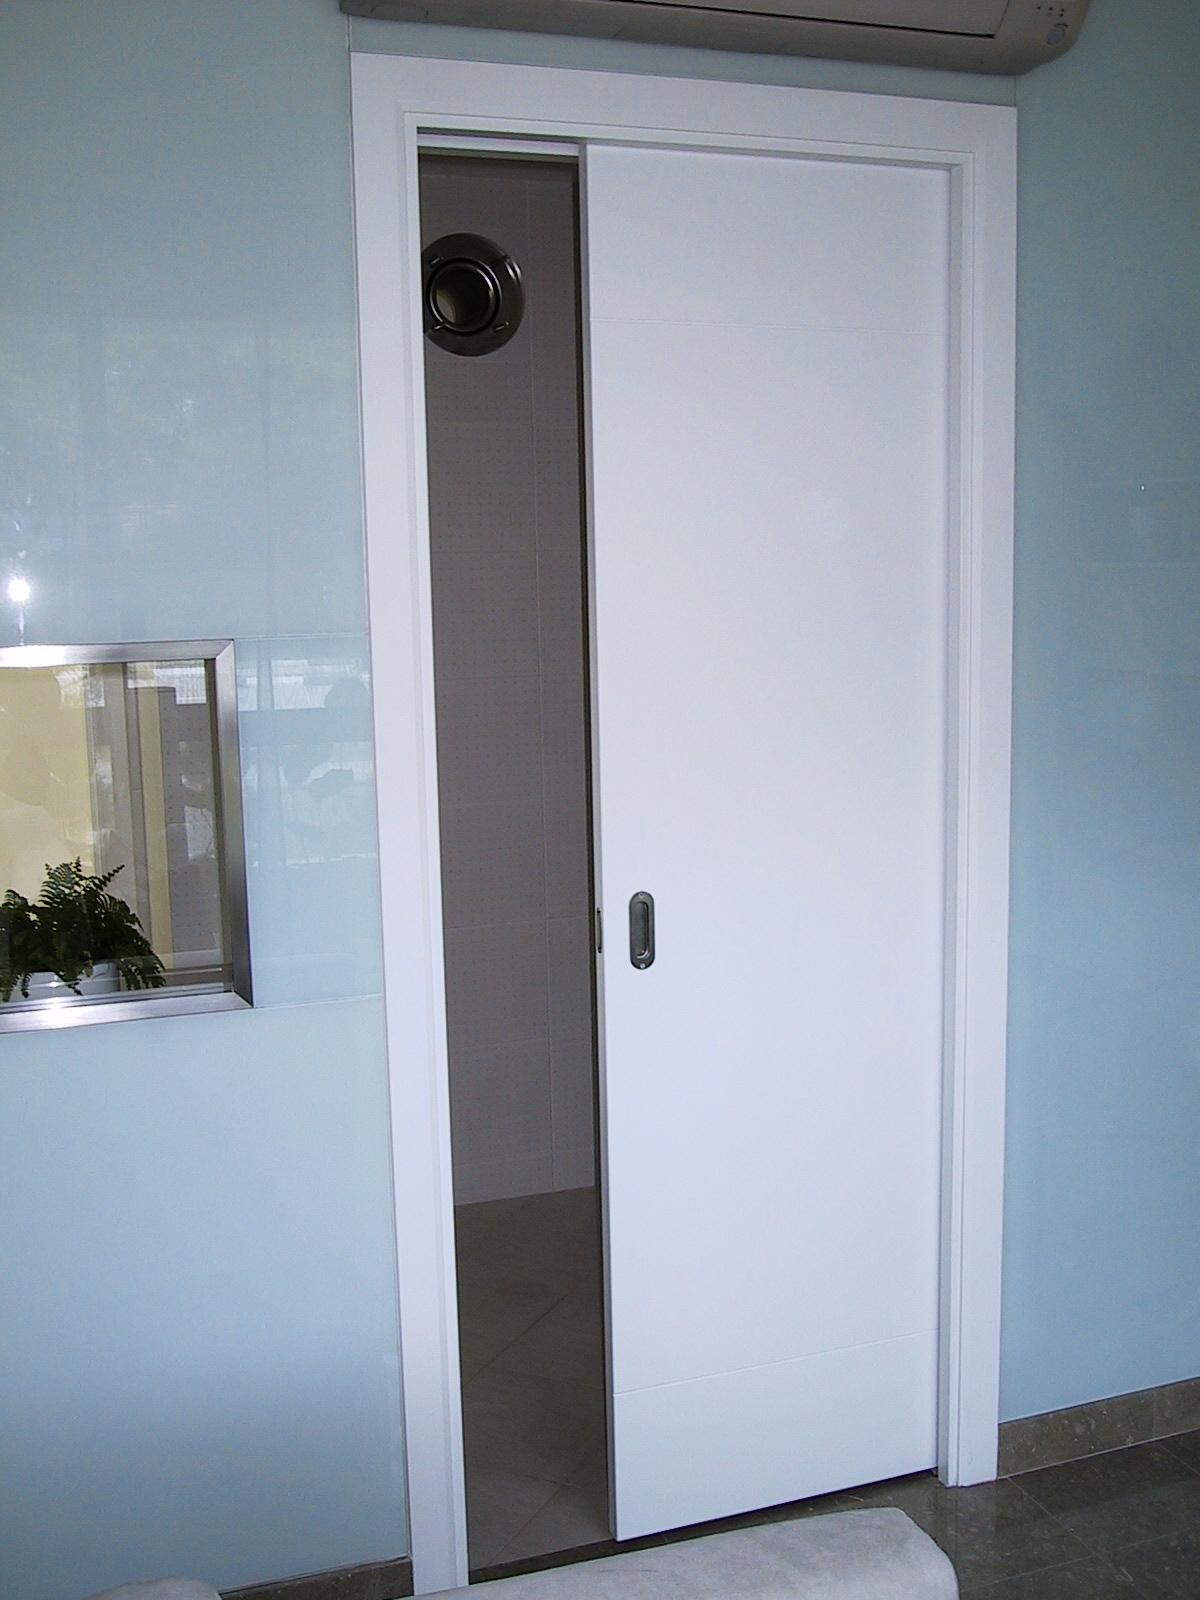 & SPECS Pocket Door System